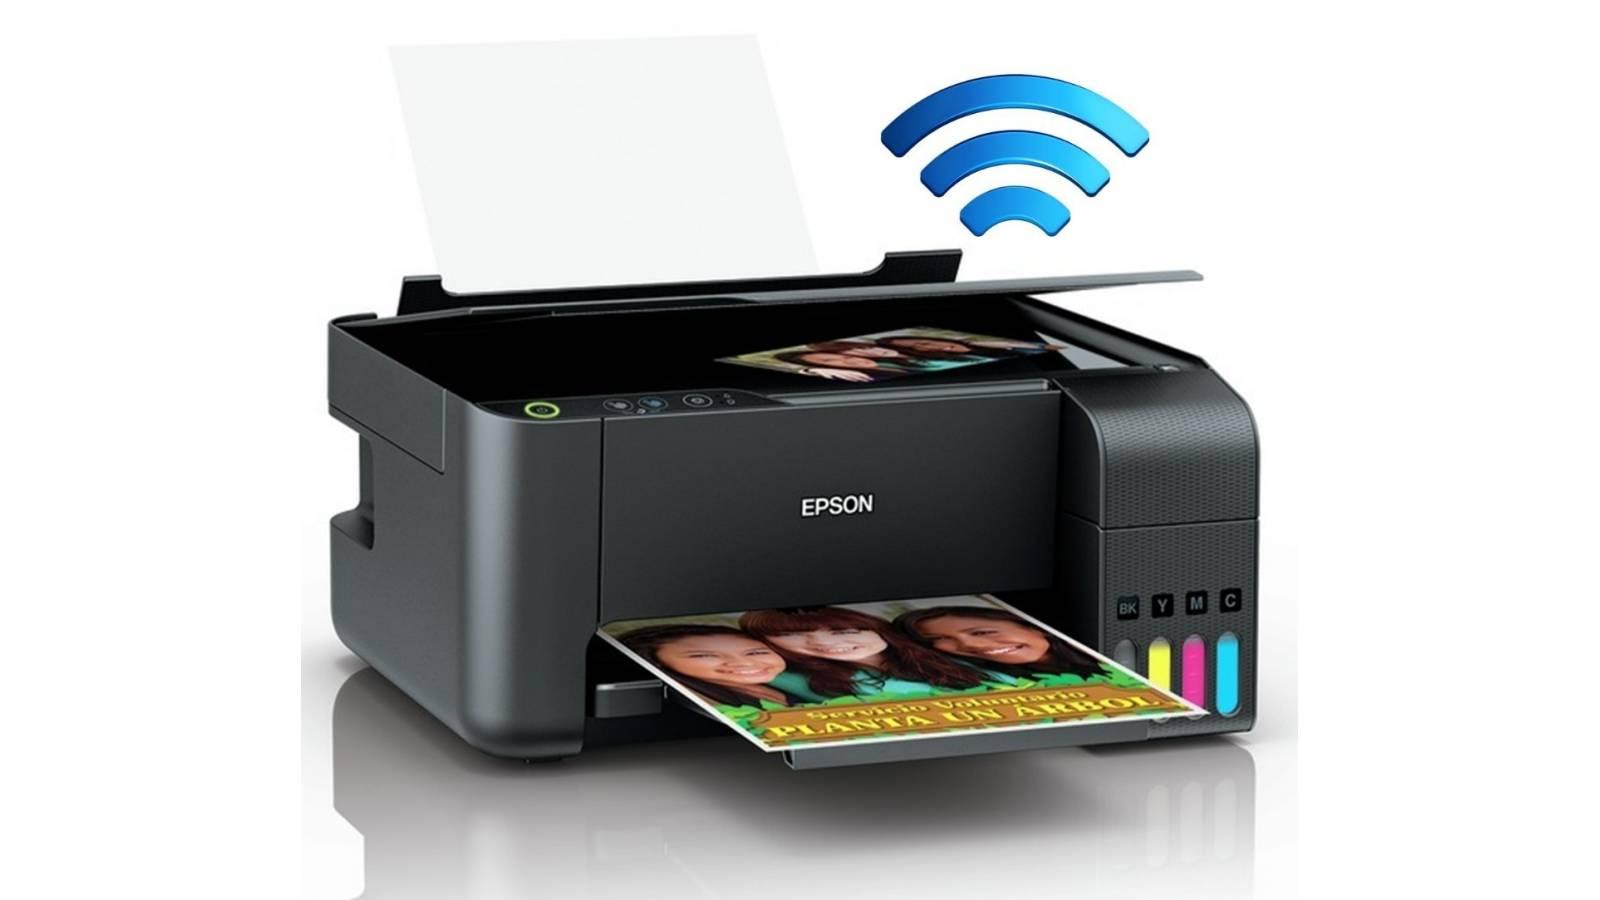 Impresora Multifuncional Epson EcoTank L3150w Wifi